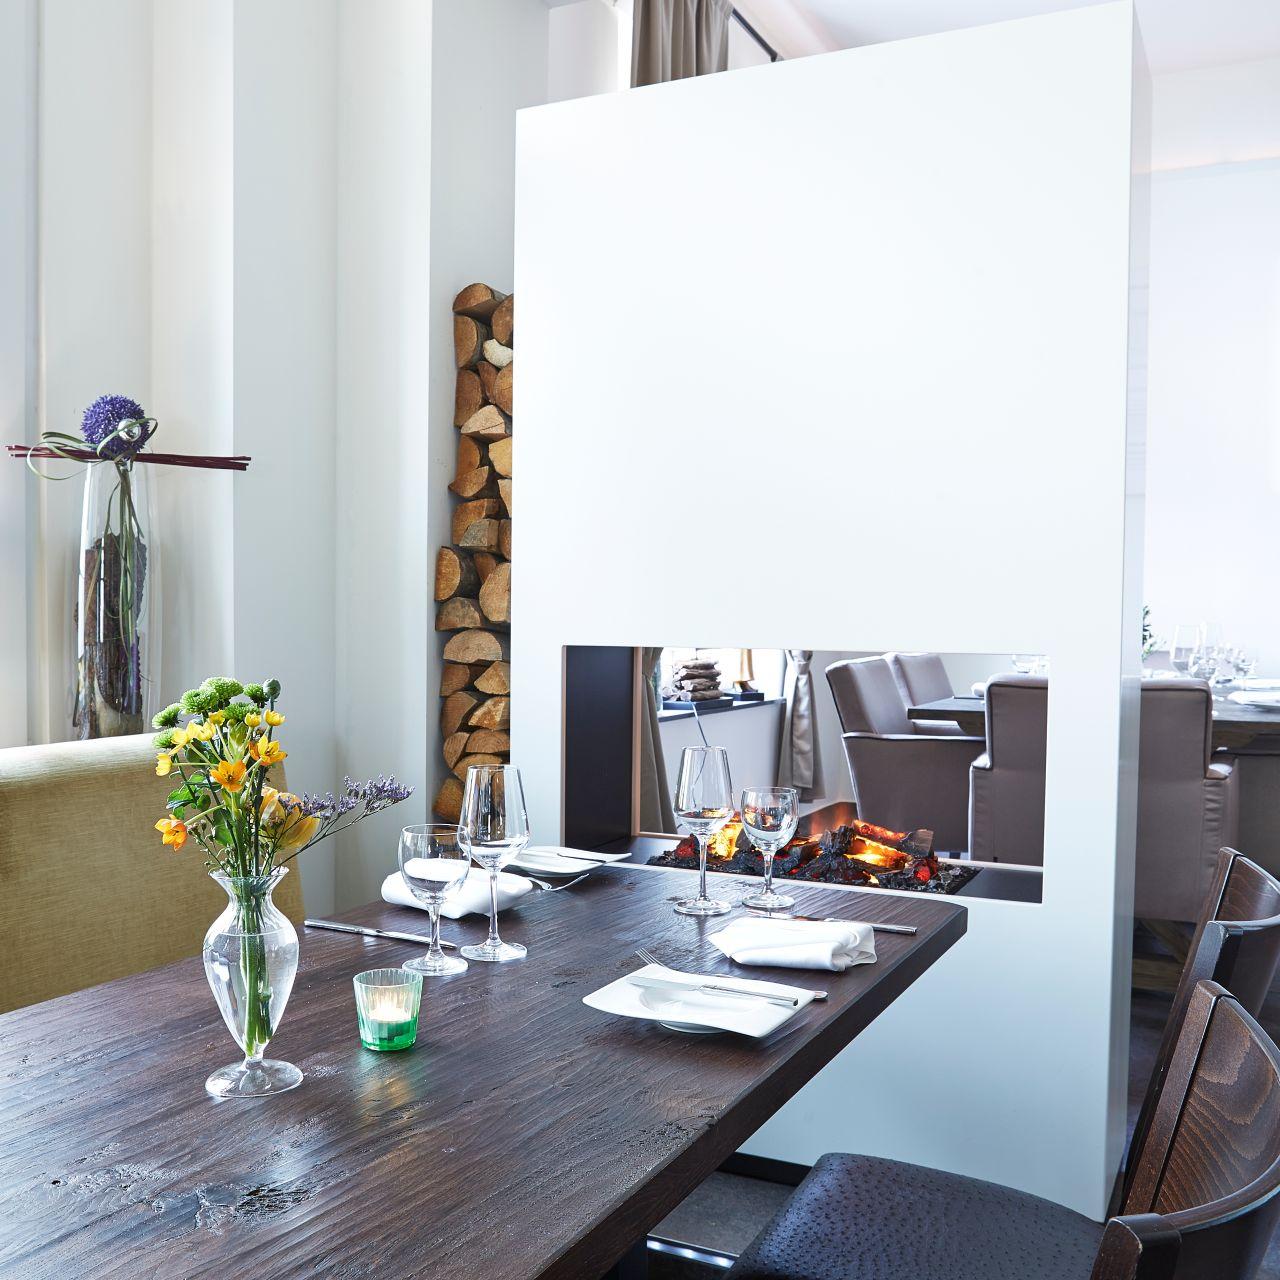 BrühlNWOpenTable Restaurant Stühle 30 30 Restaurant Stühle nk8OX0wP